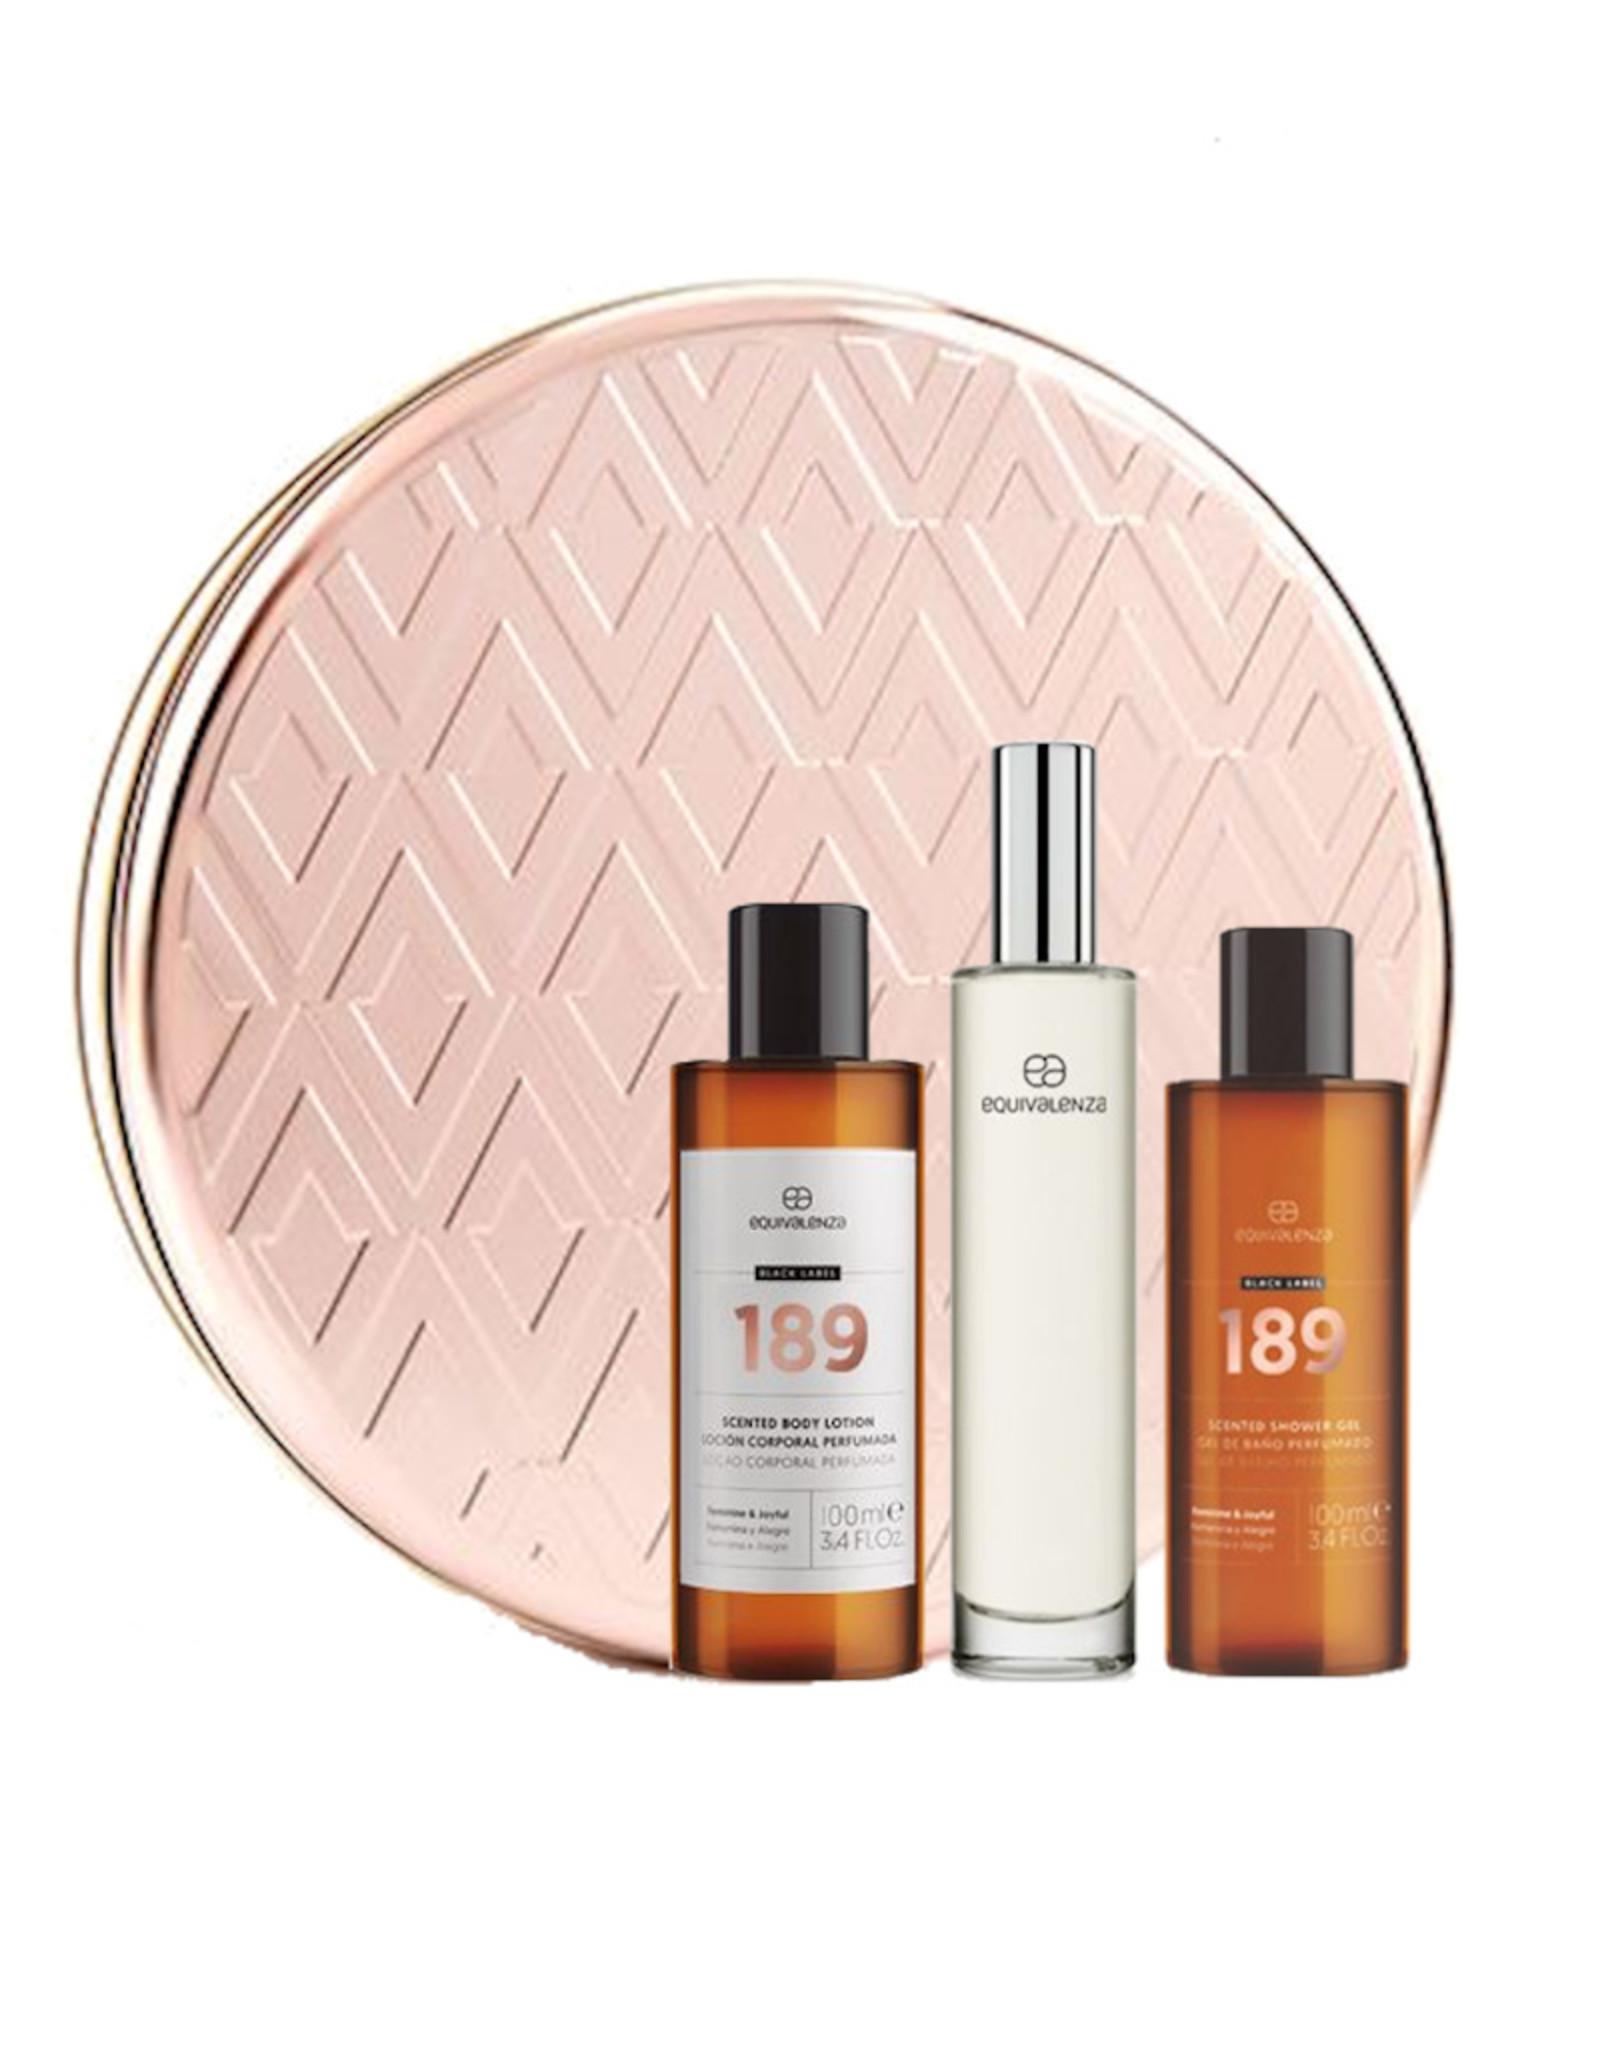 Equivalenza Gift Box - Perfume - Shower Gel - Body Lotion -189